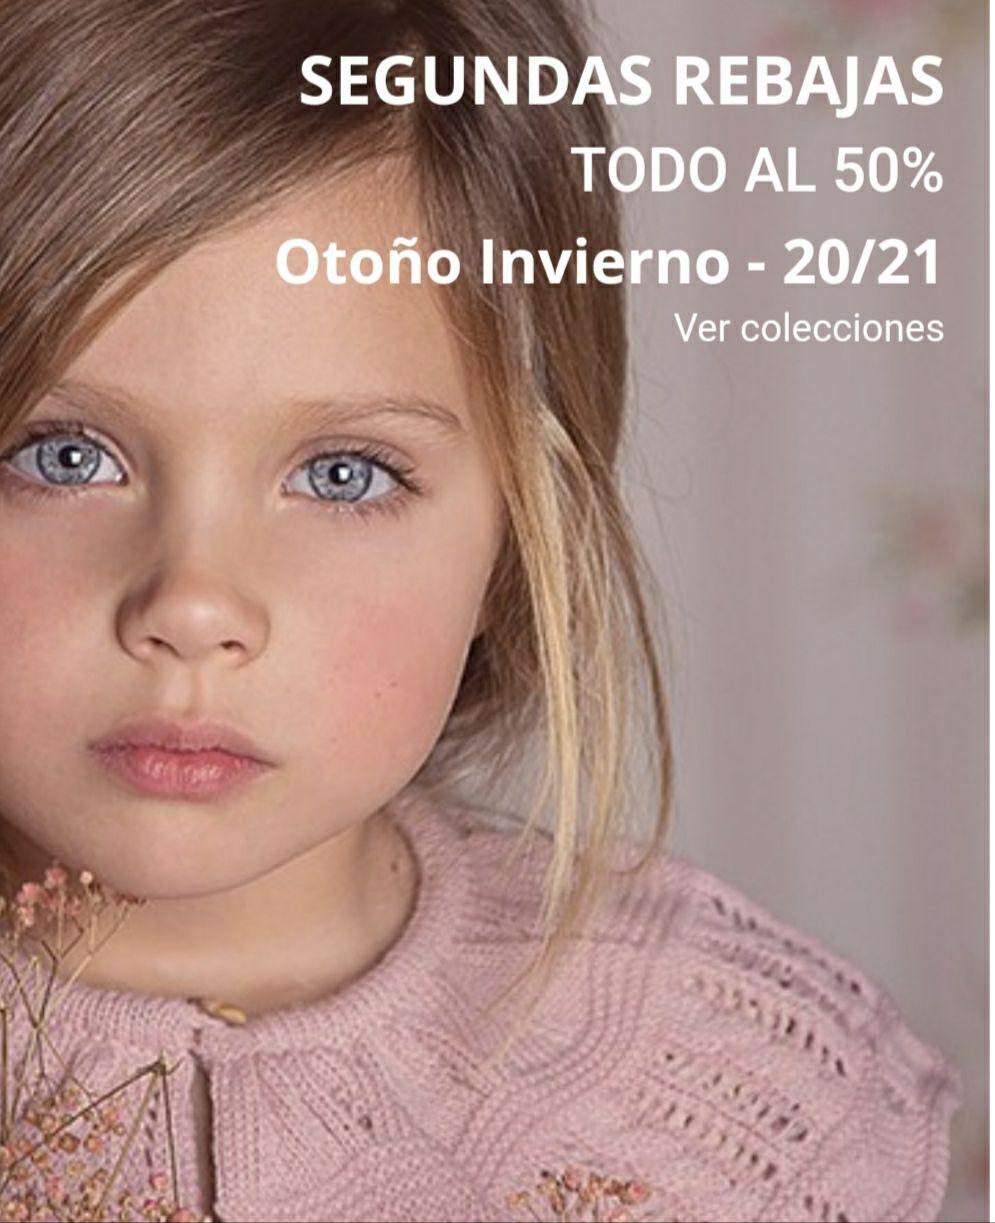 REBAJAS INFANTILES 50%